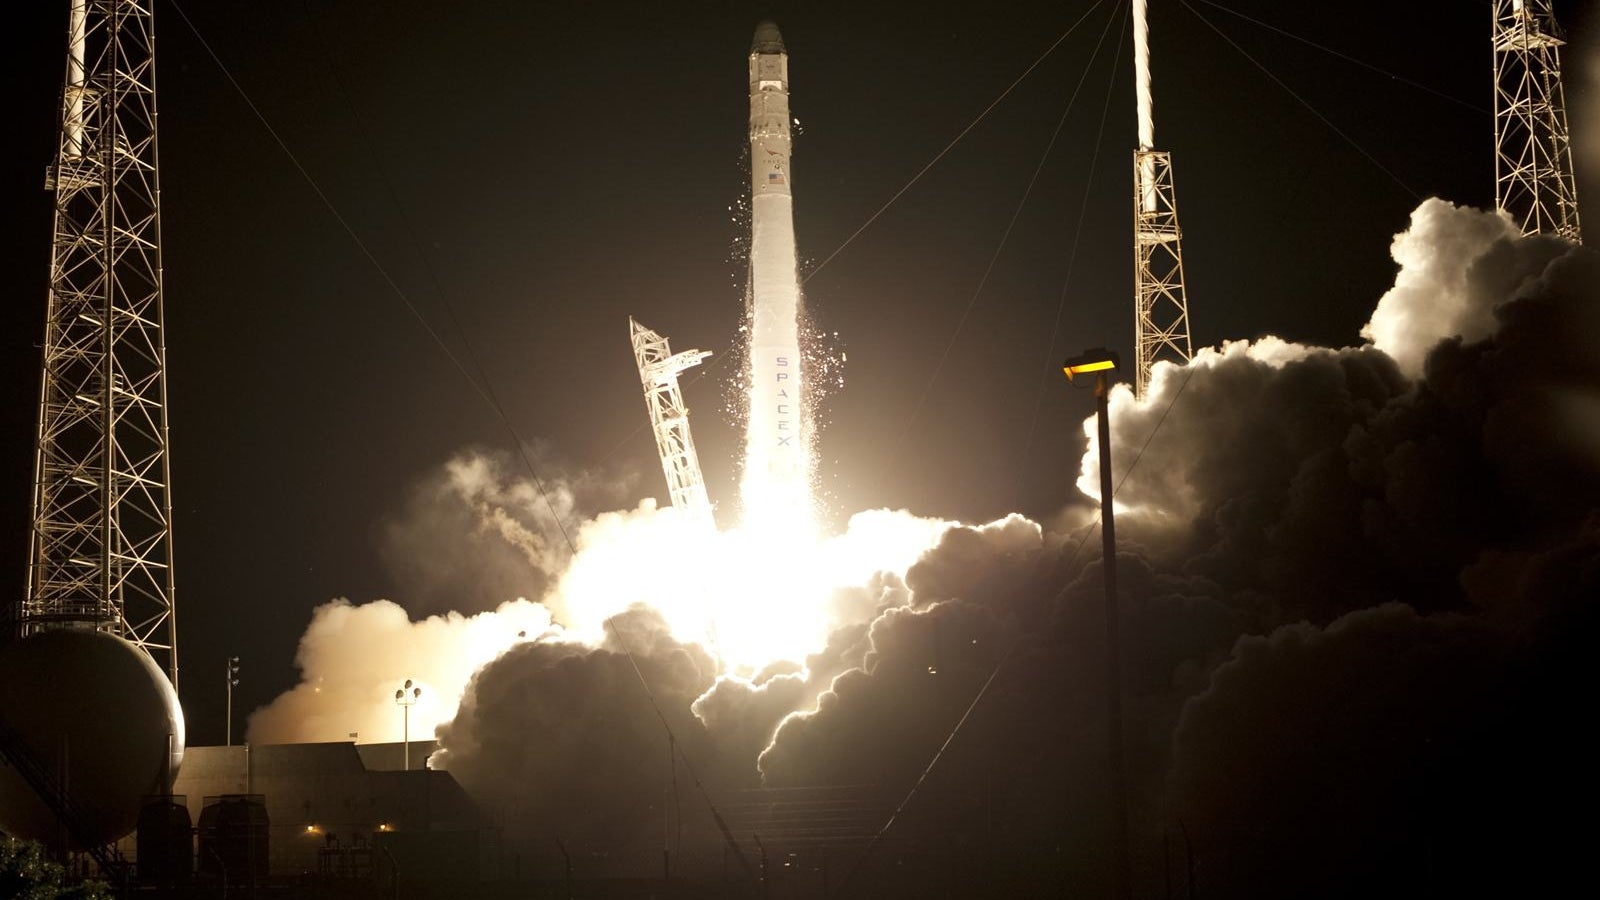 spacex thruster - photo #10